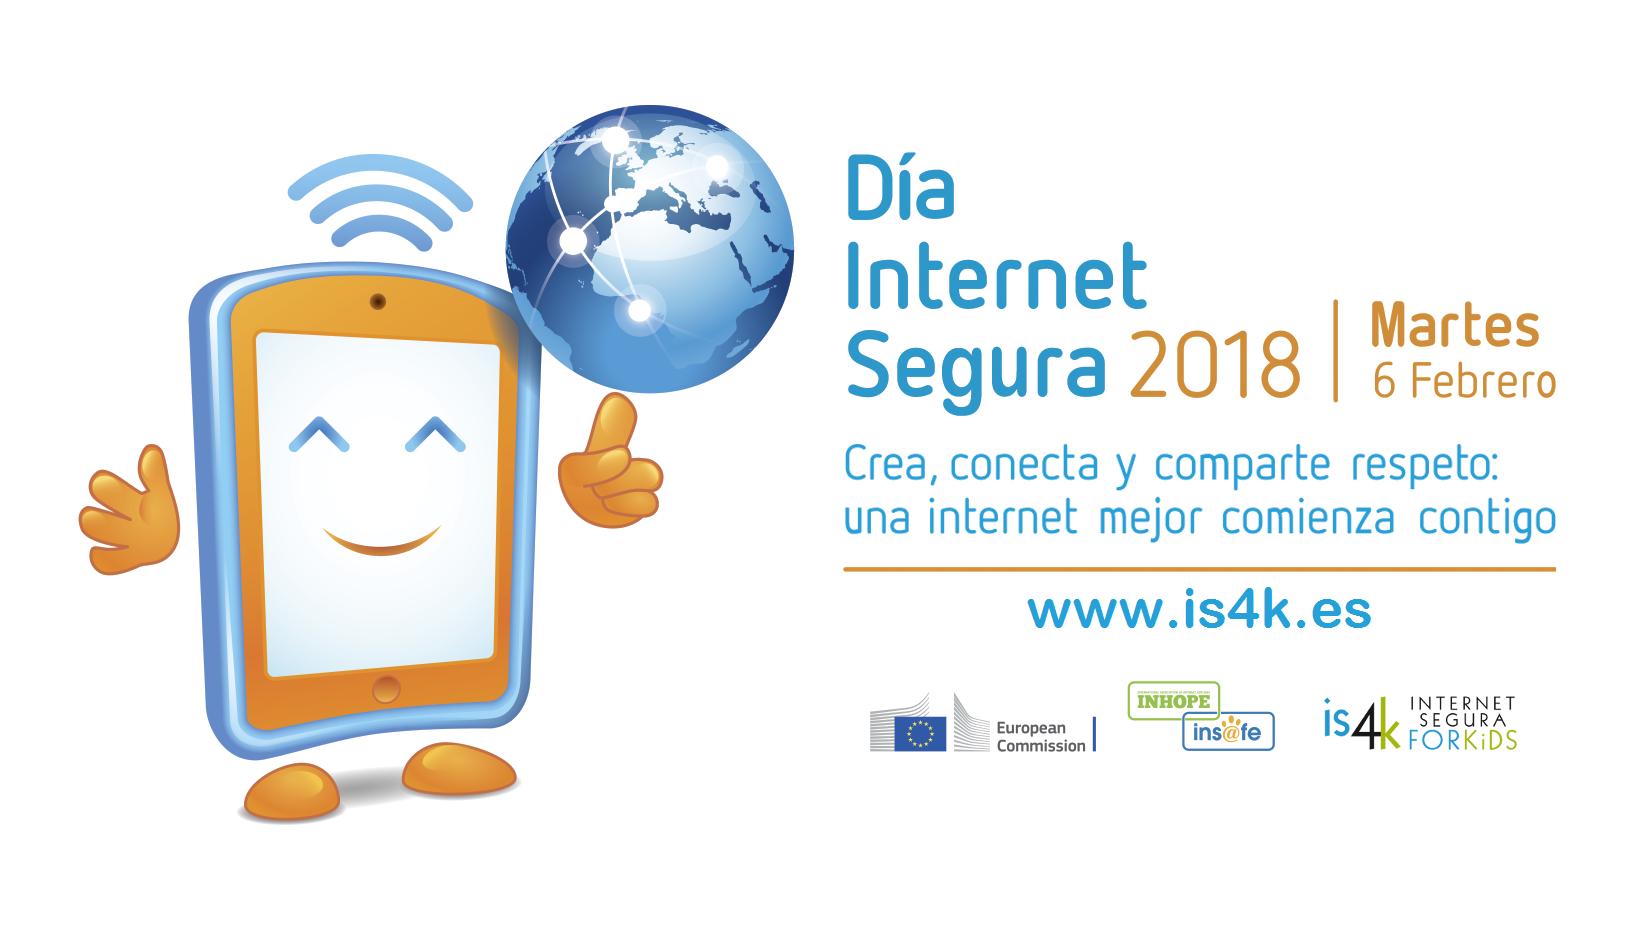 Día de Internet Segura 2018